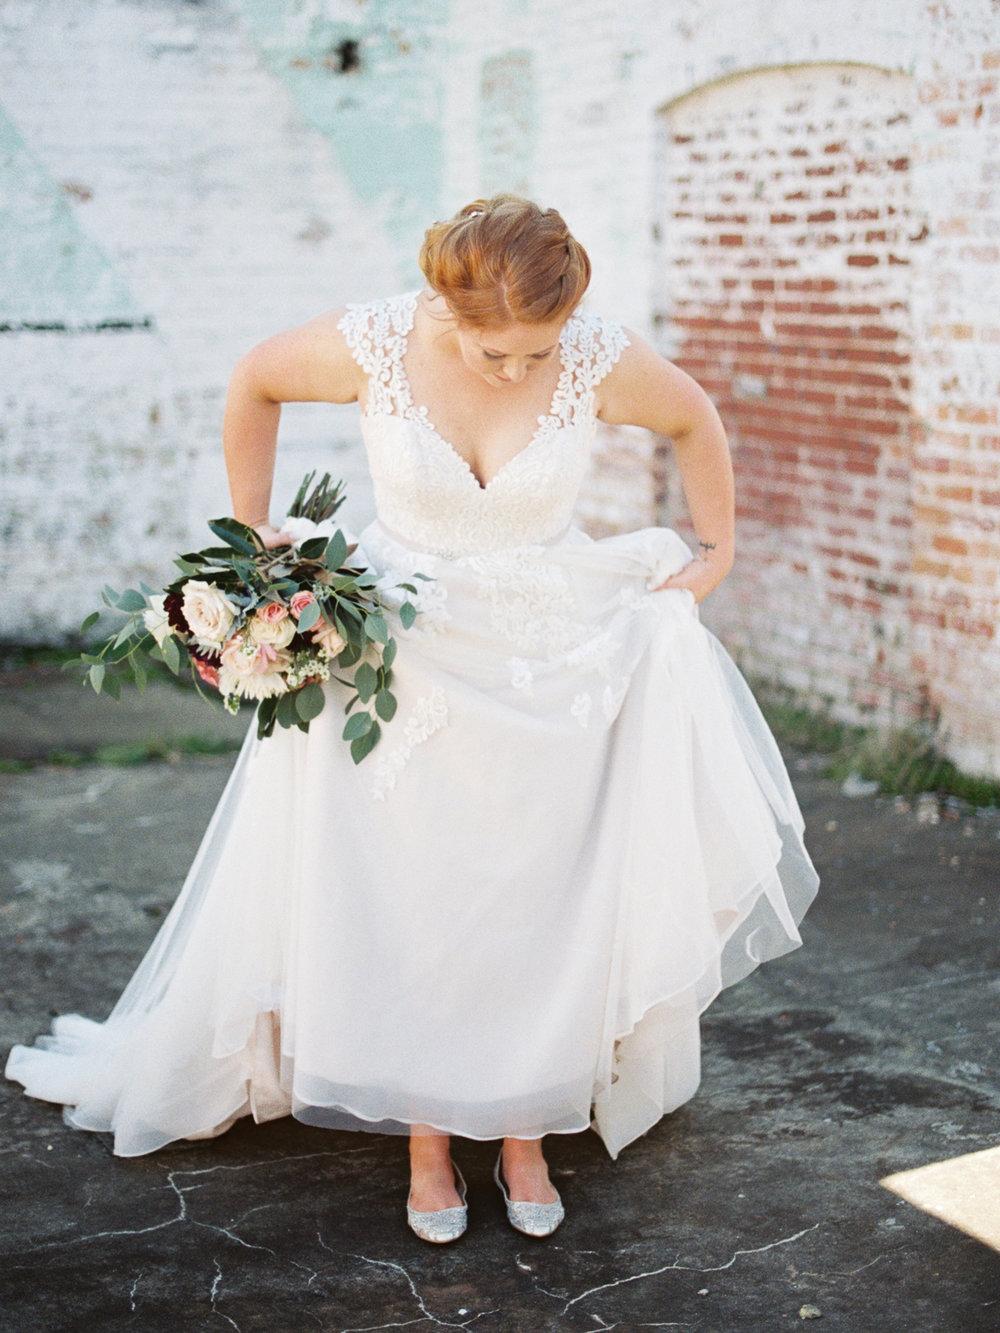 christinadavisphotography+realwedding+aprilfirst11.jpg